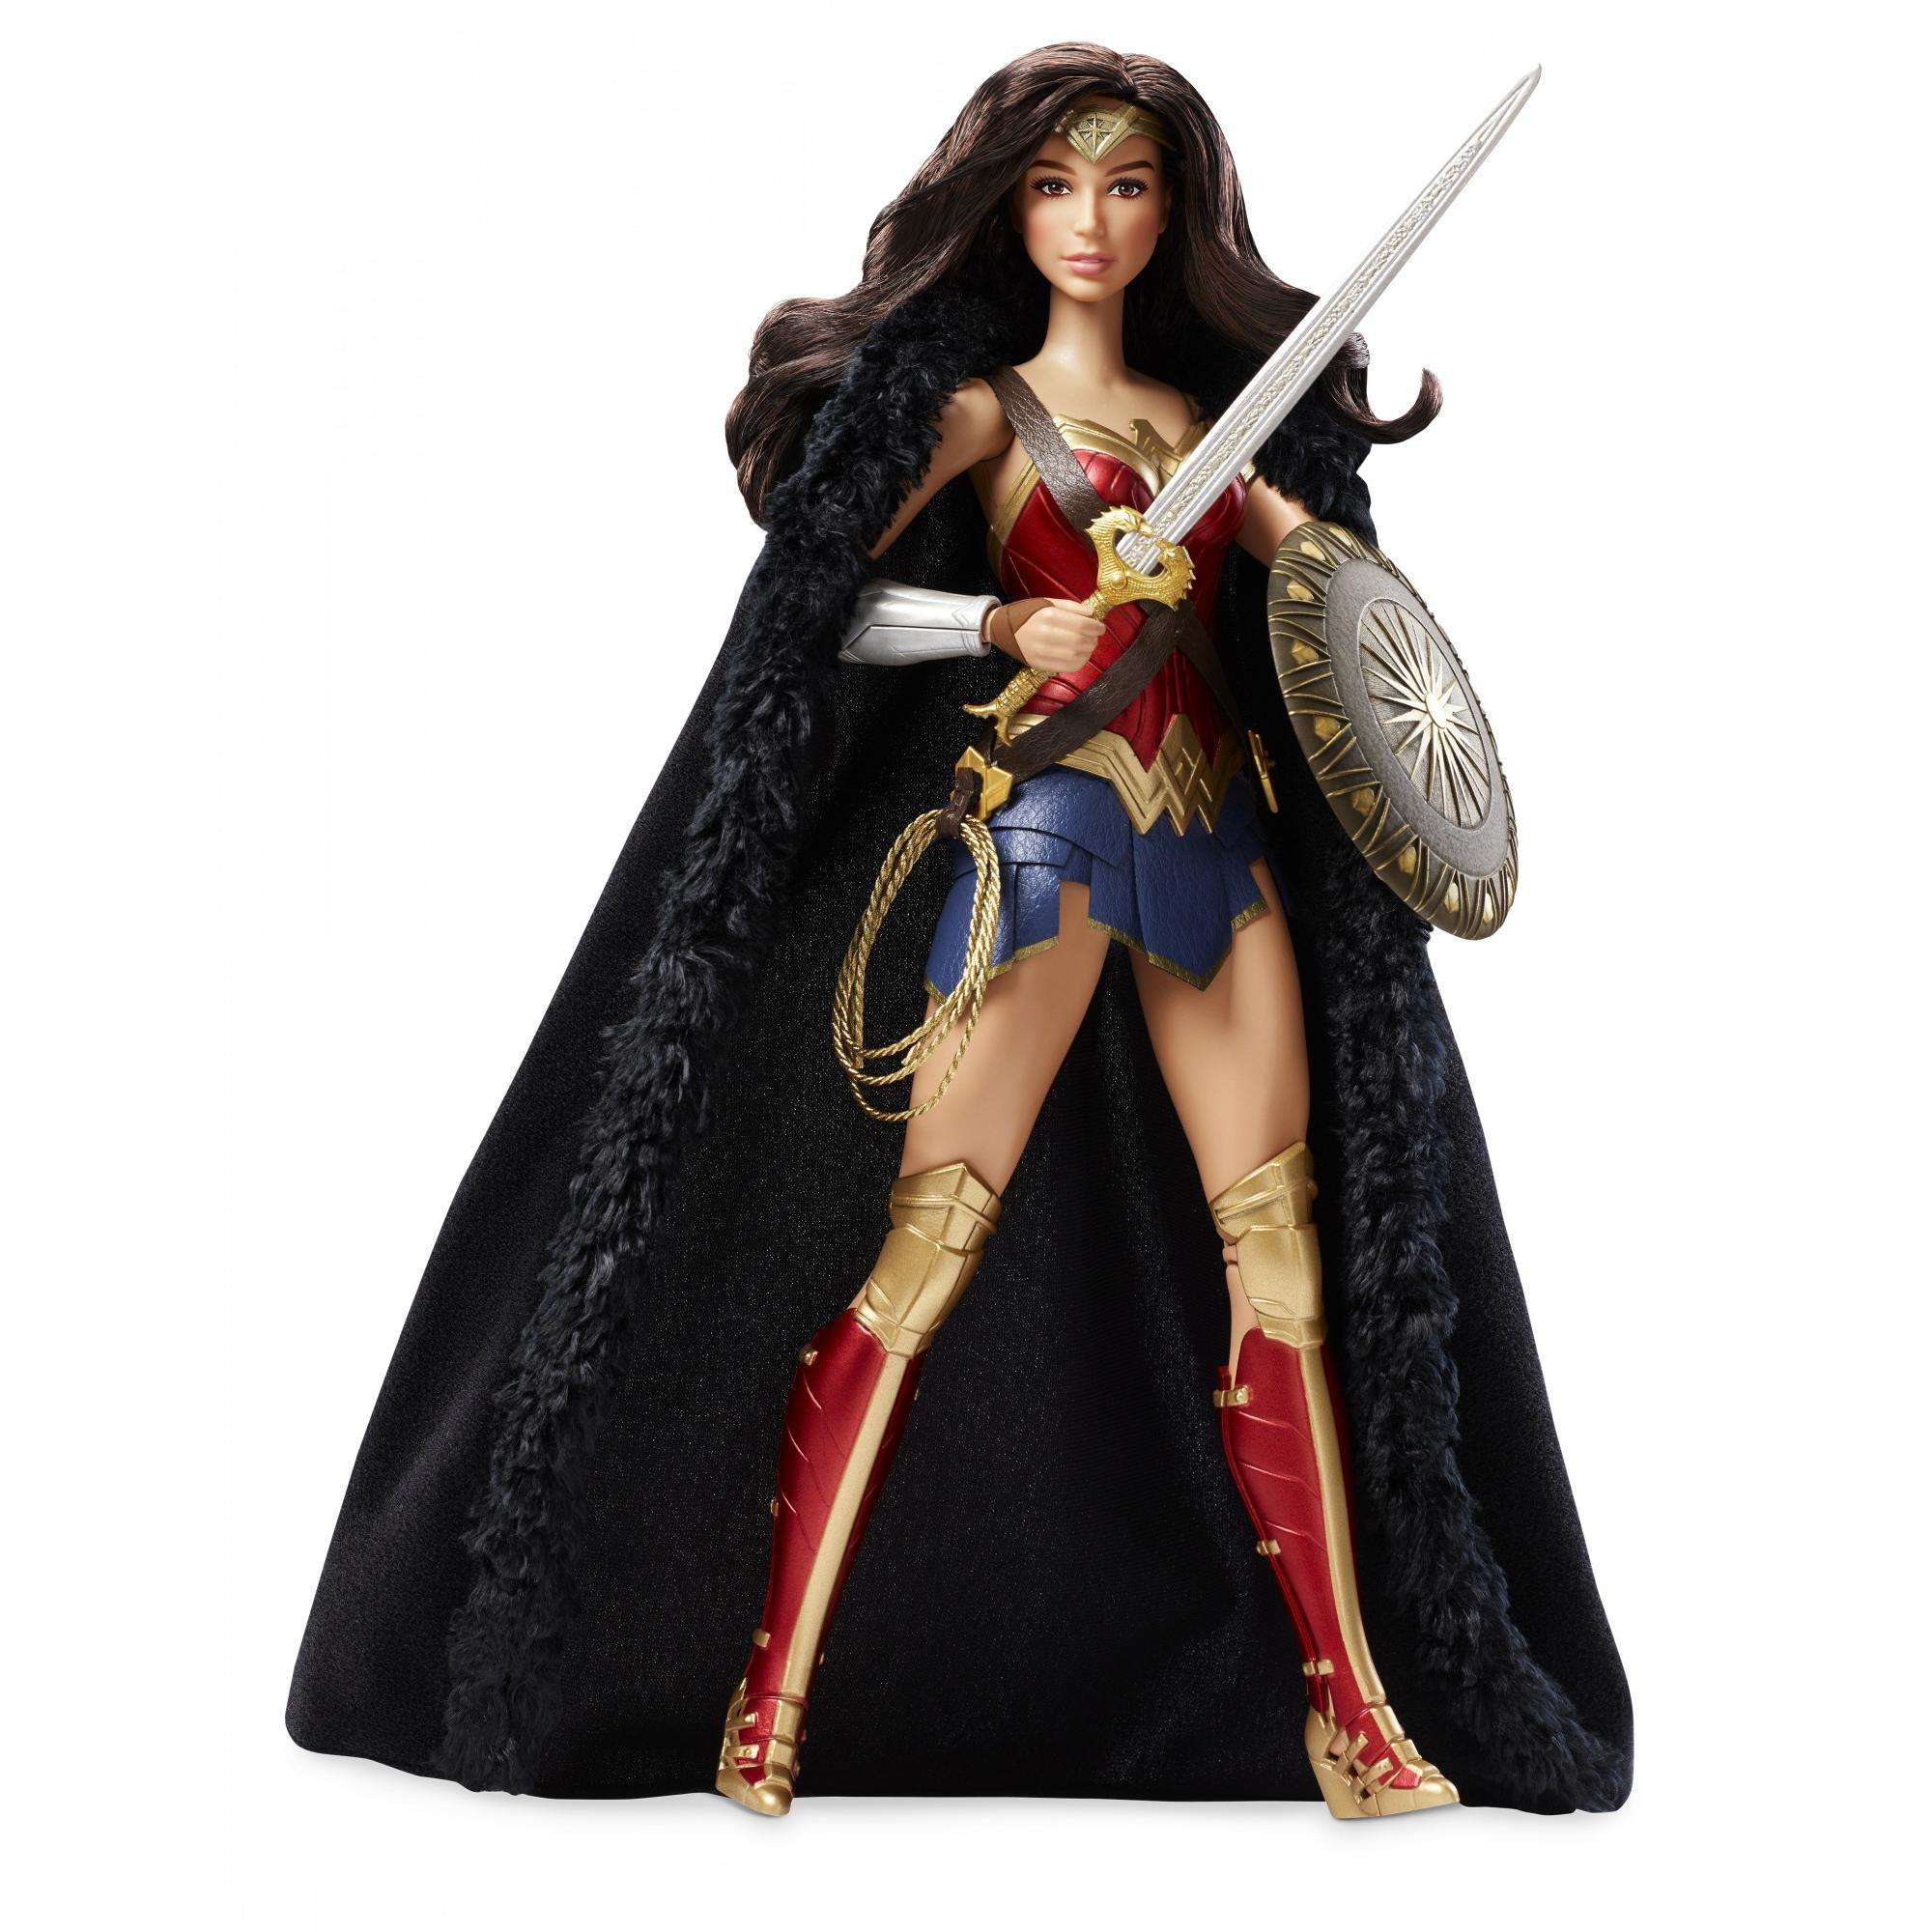 Barbie Wonder Woman Doll by MATTEL INC.